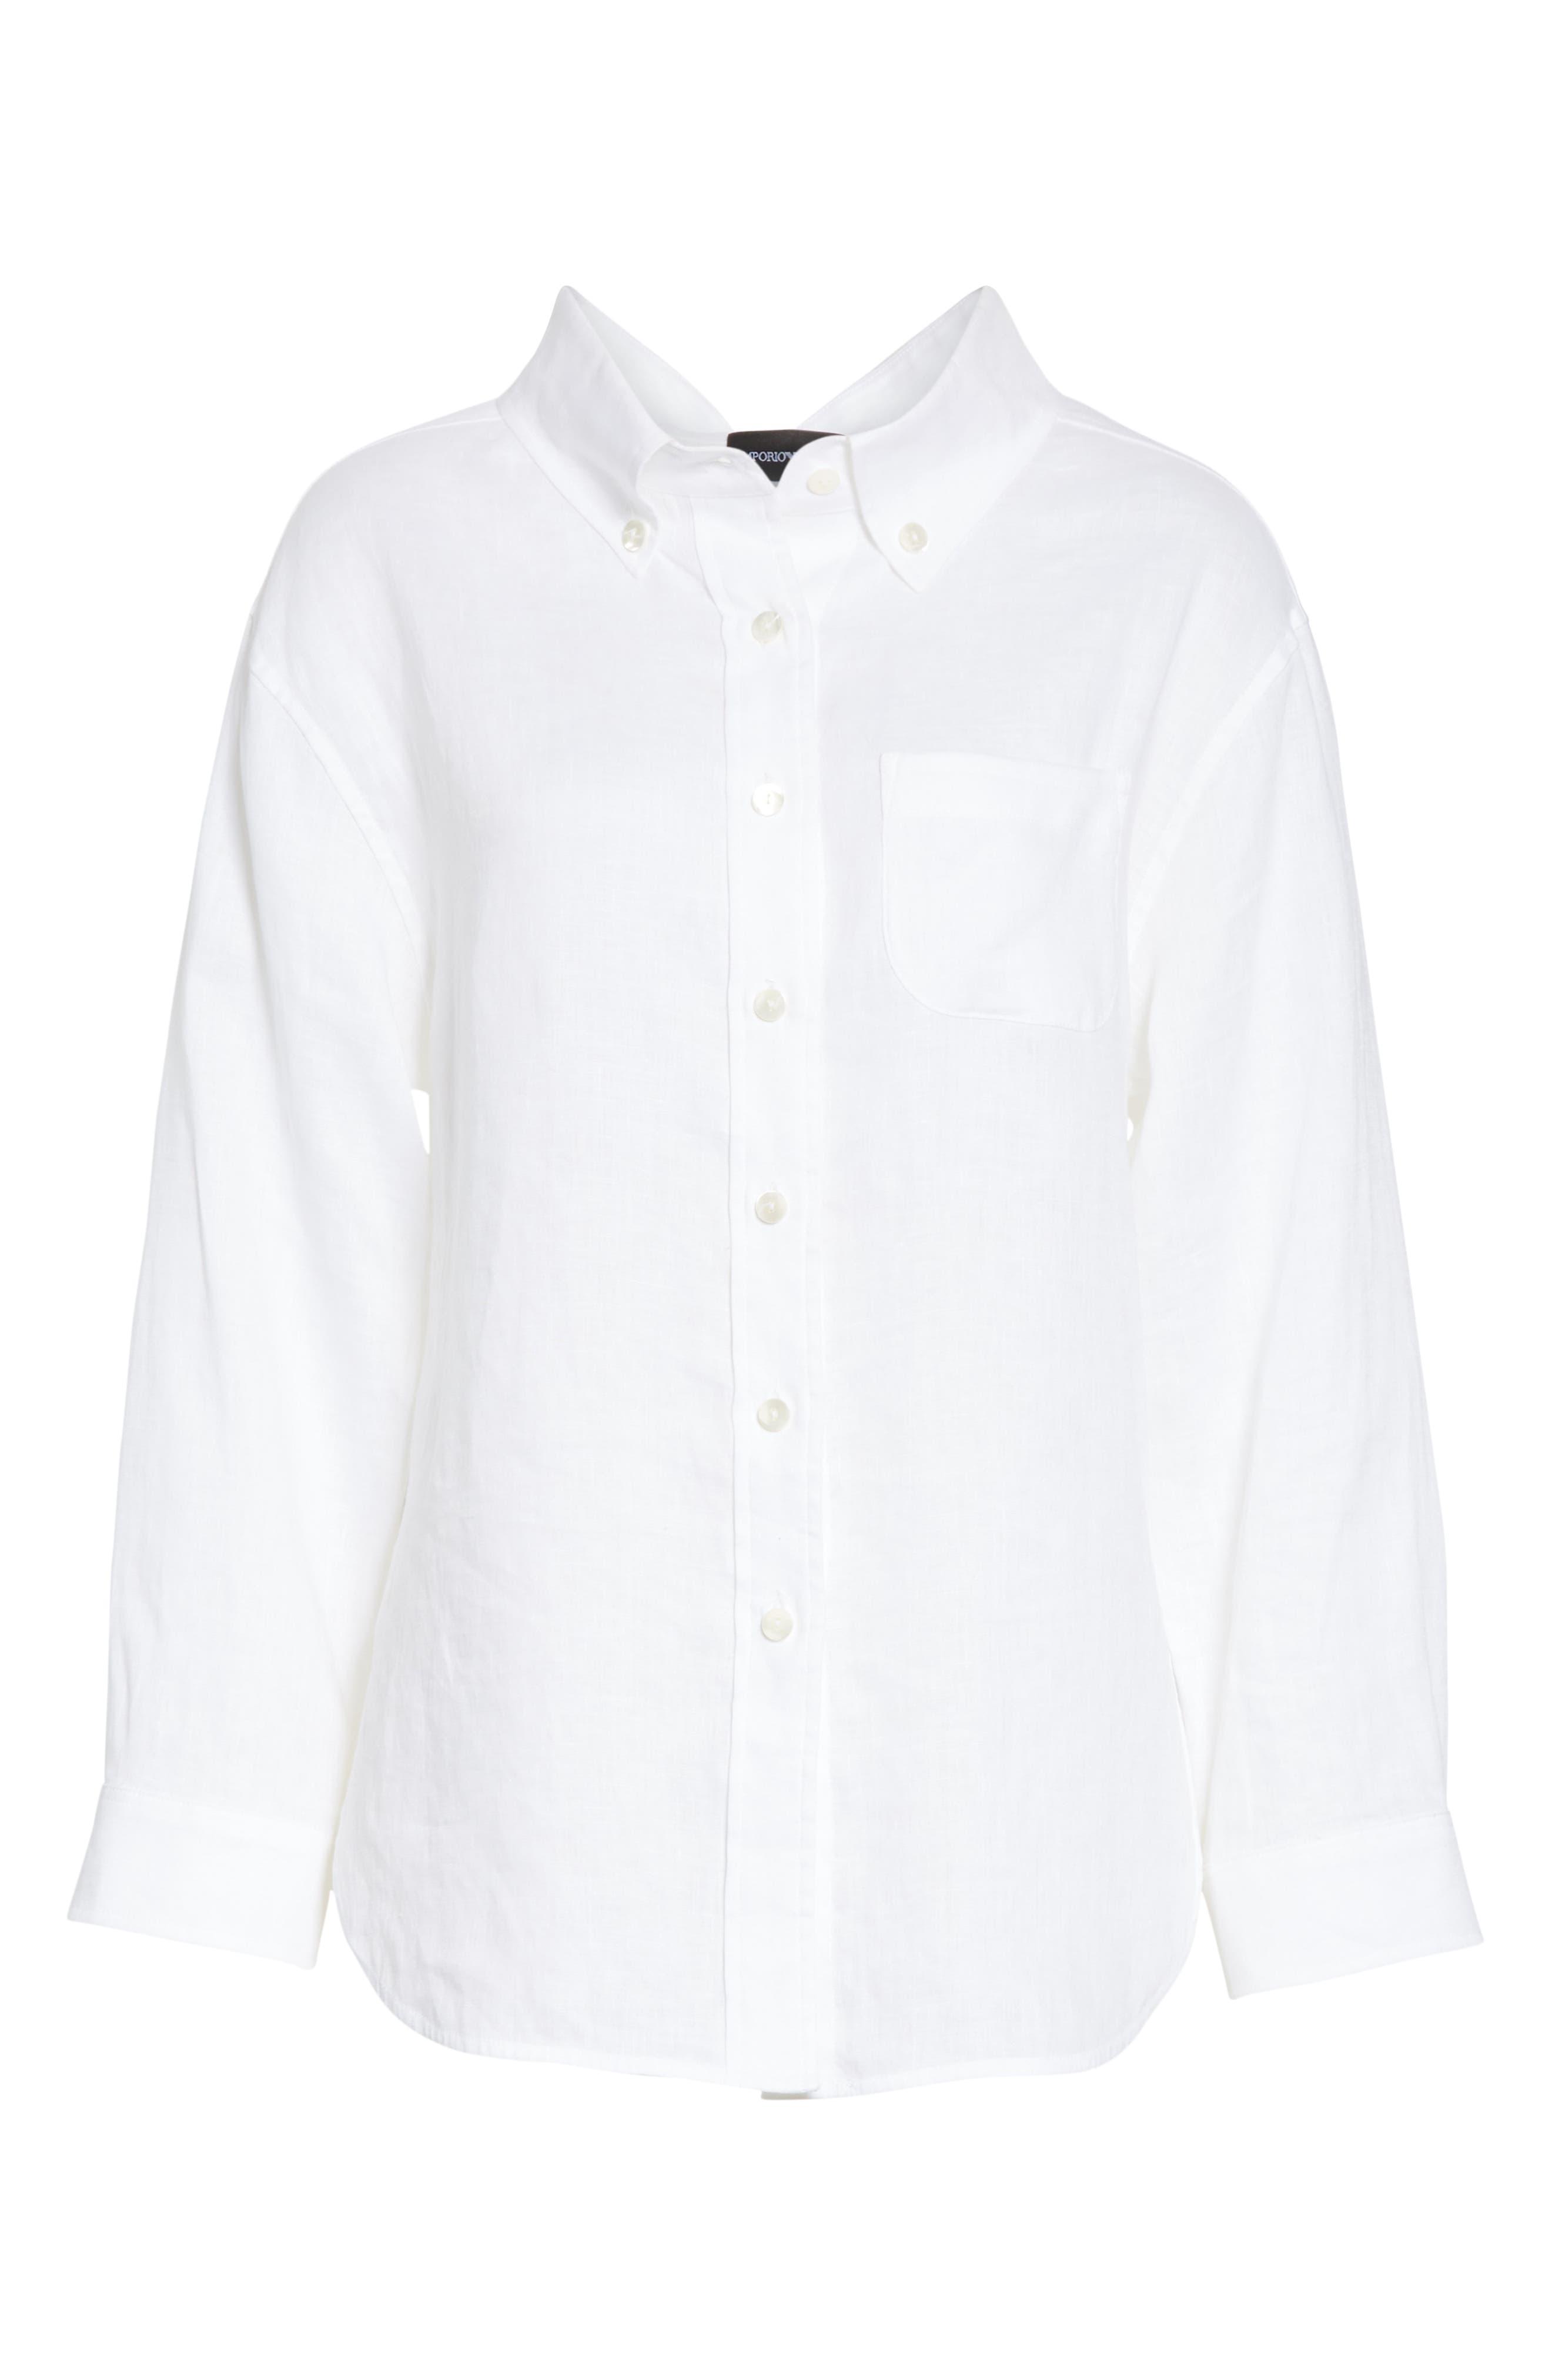 EMPORIO ARMANI,                             Long Sleeve Linen Blouse,                             Alternate thumbnail 6, color,                             BIANCO